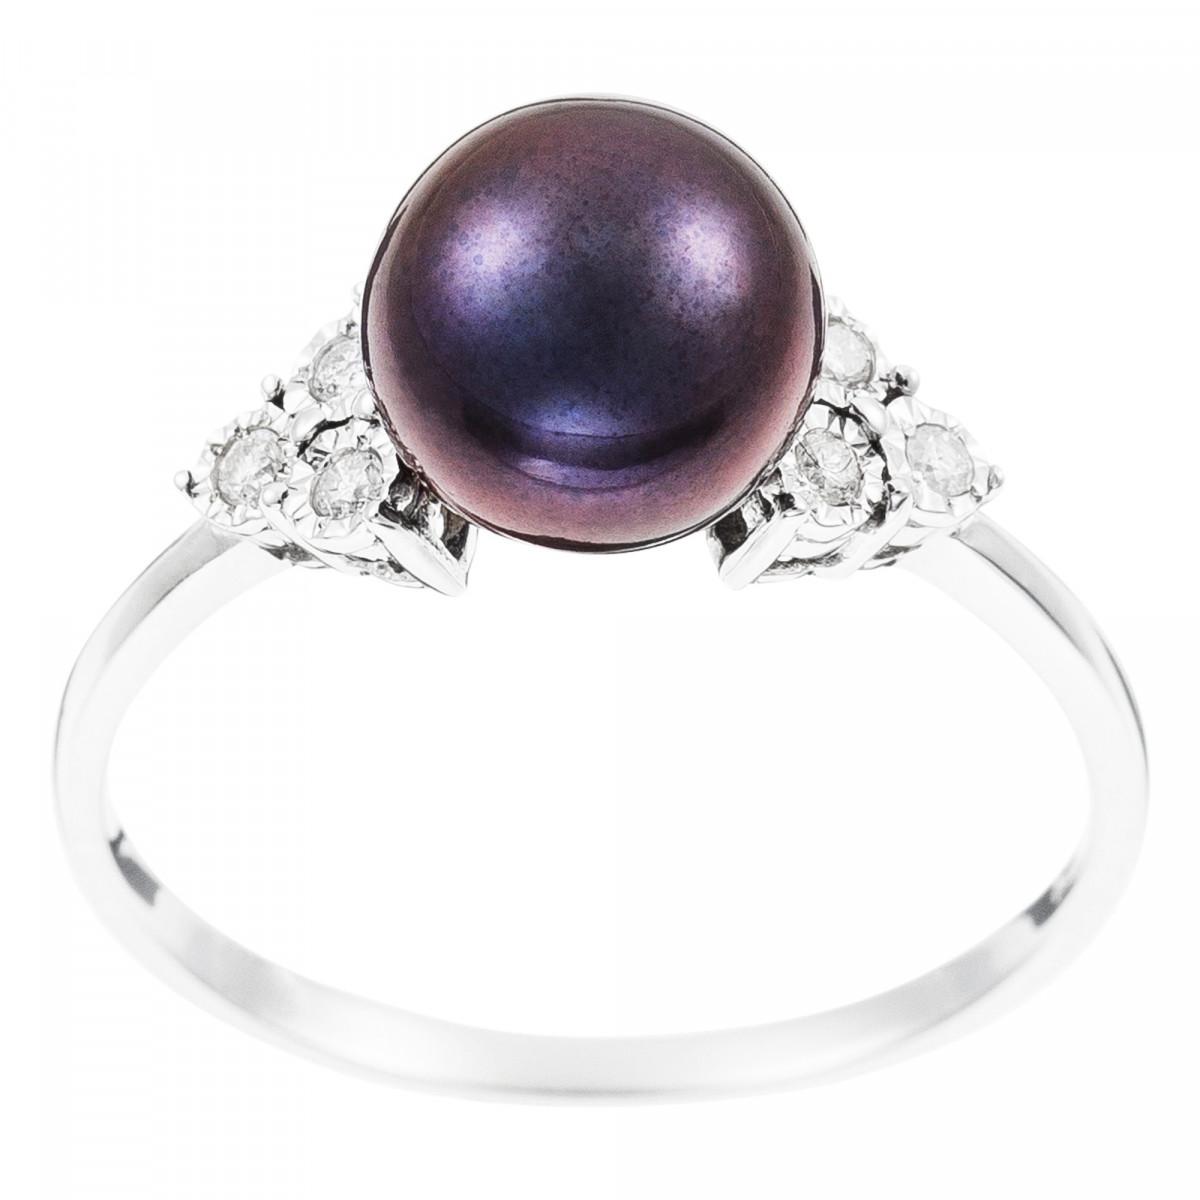 "Bague Or Blanc 375 ""TRIANGLE&PEARL"" Diamants 0,07 carat et Perle"